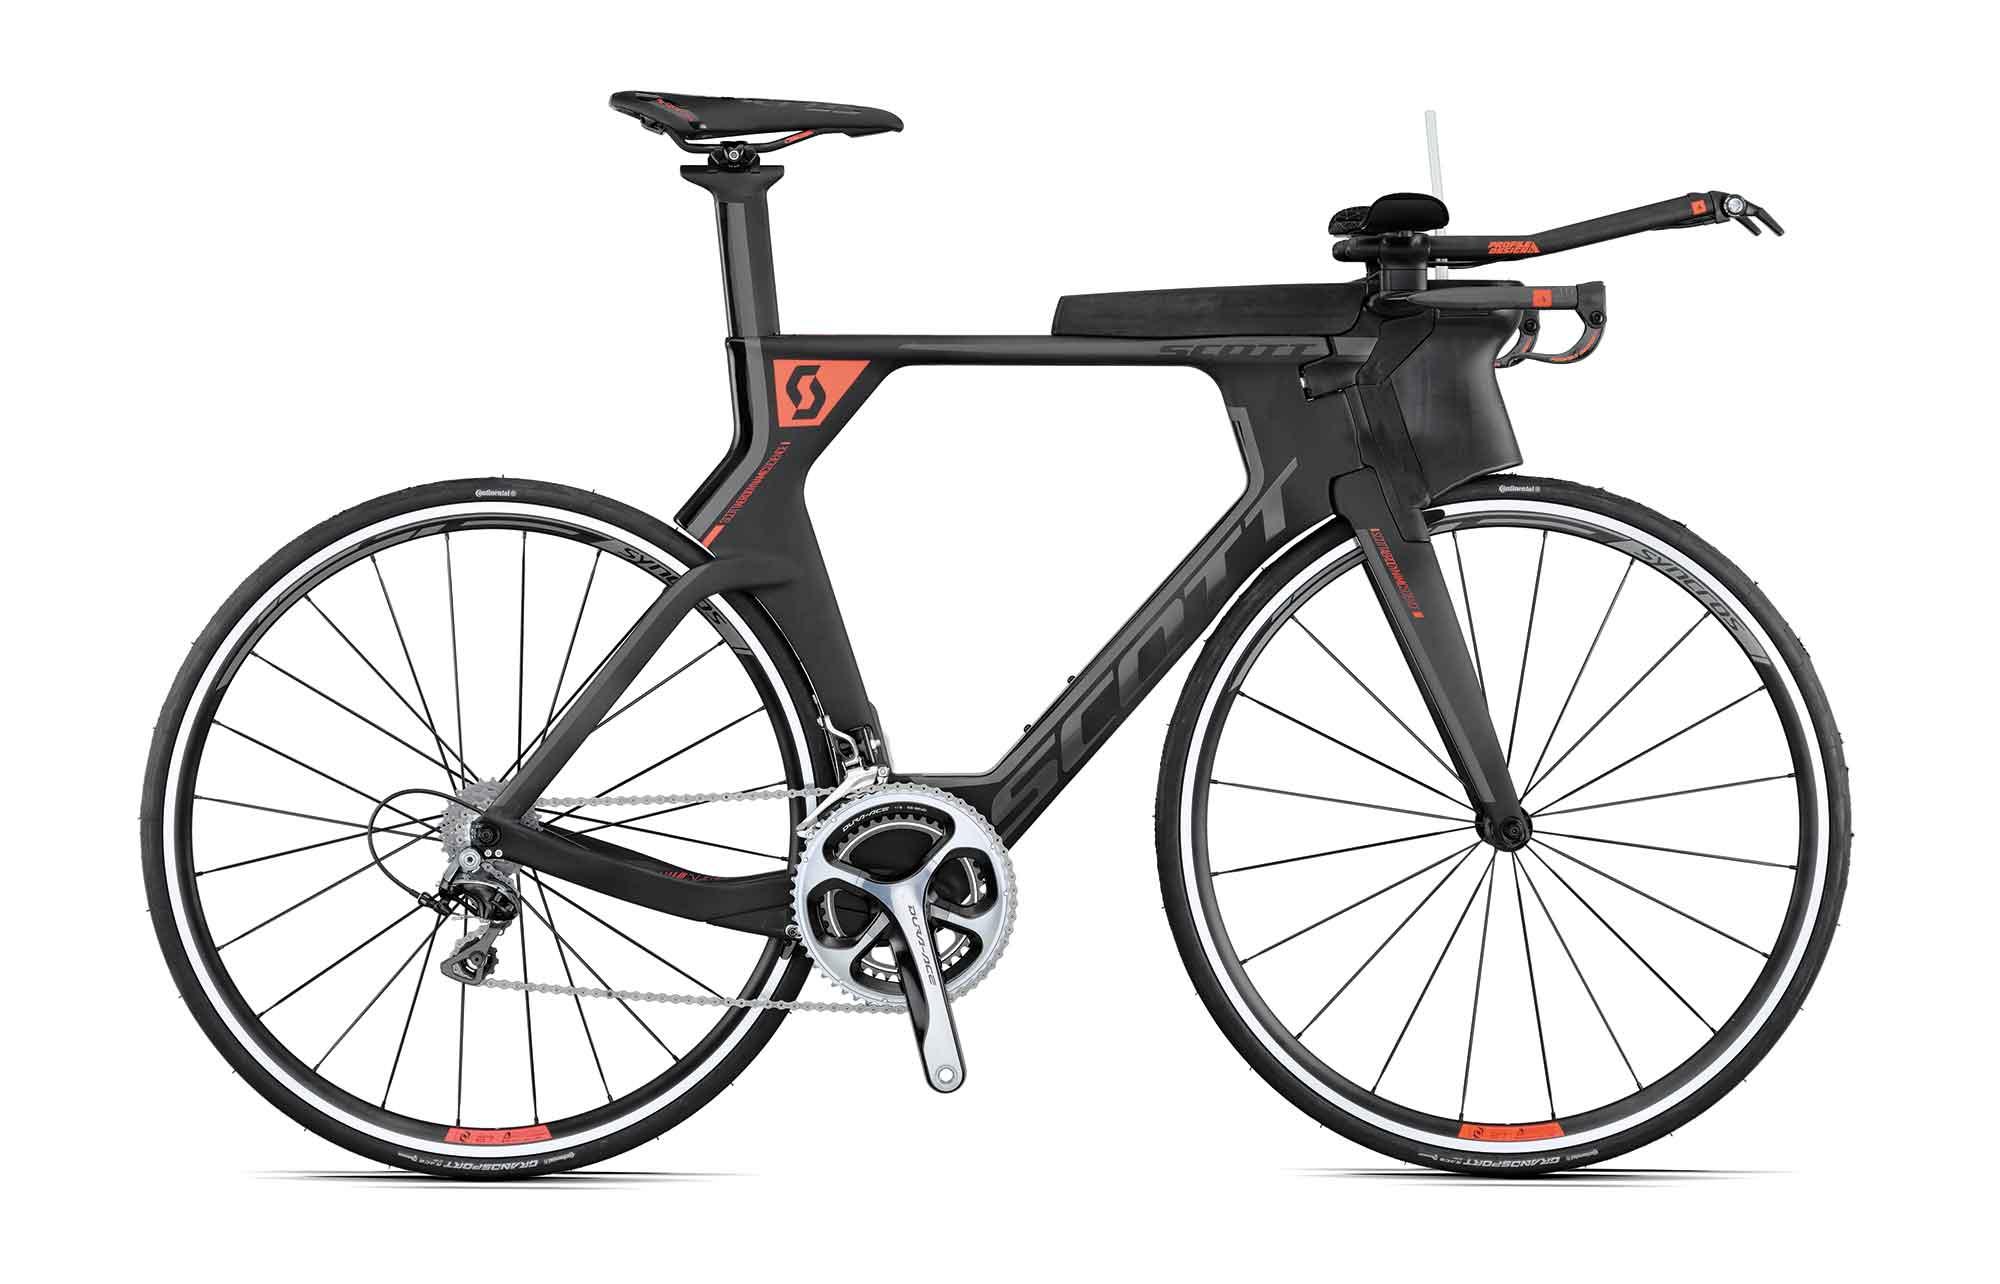 2015 Scott Plasma Premium Bike R Amp A Cycles